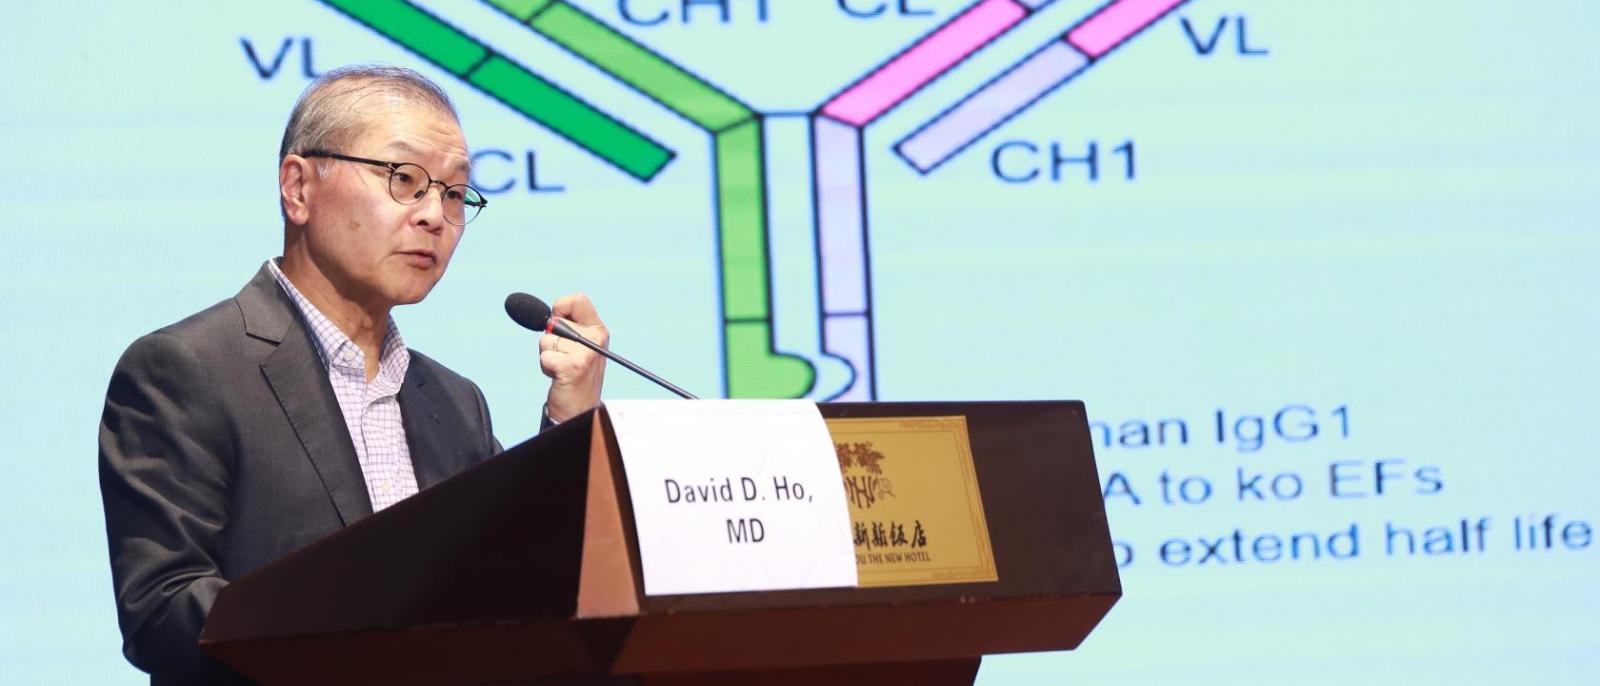 David Ho, MD, presented at the 2019 symposium in Hangzhou, China.